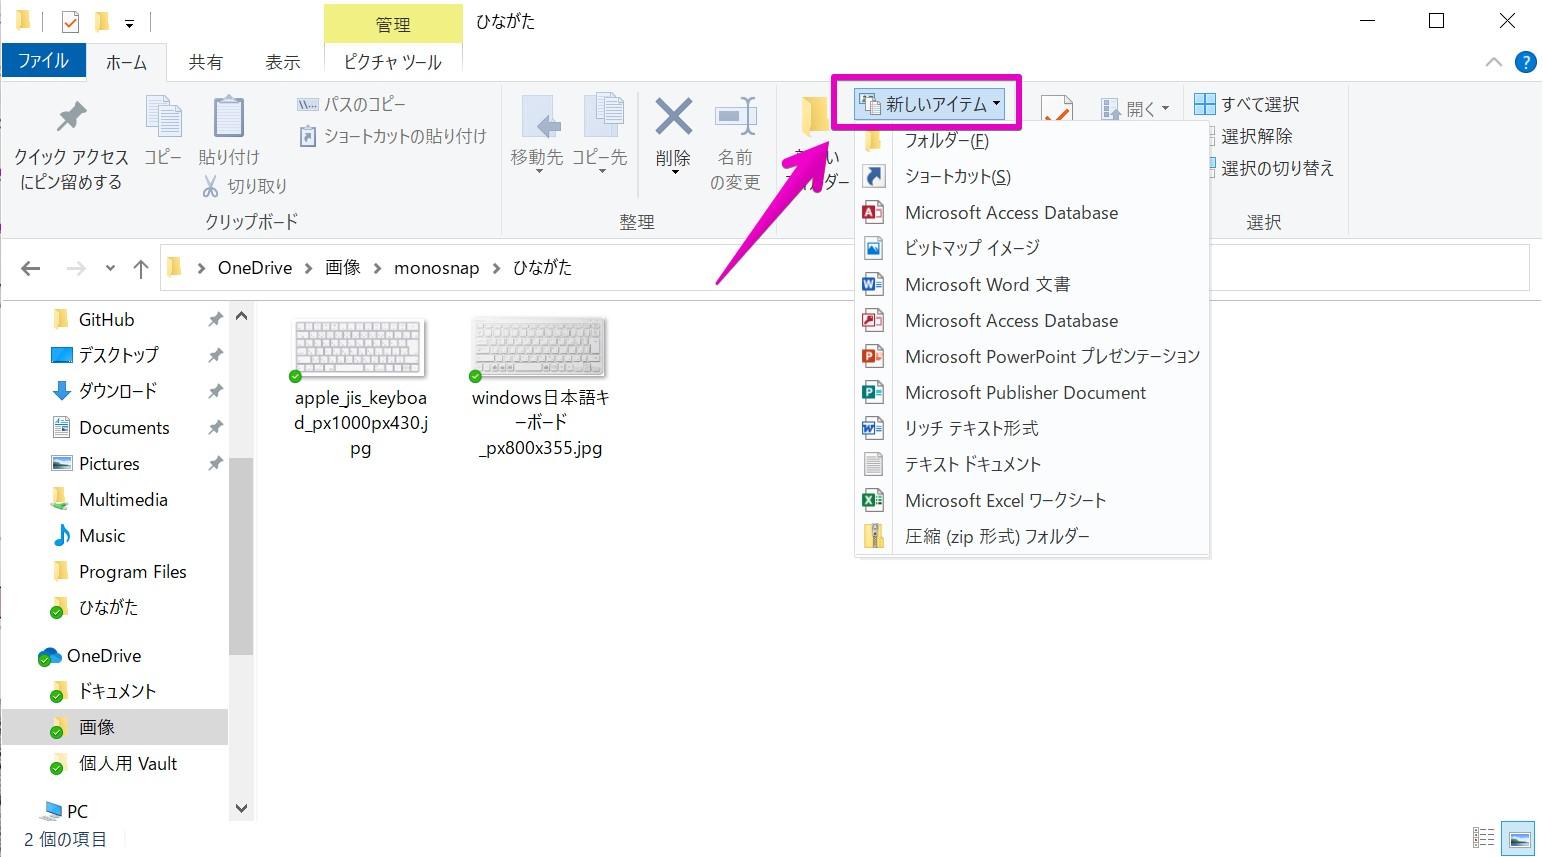 WindowsでOneDrive内に新規ファイル作成